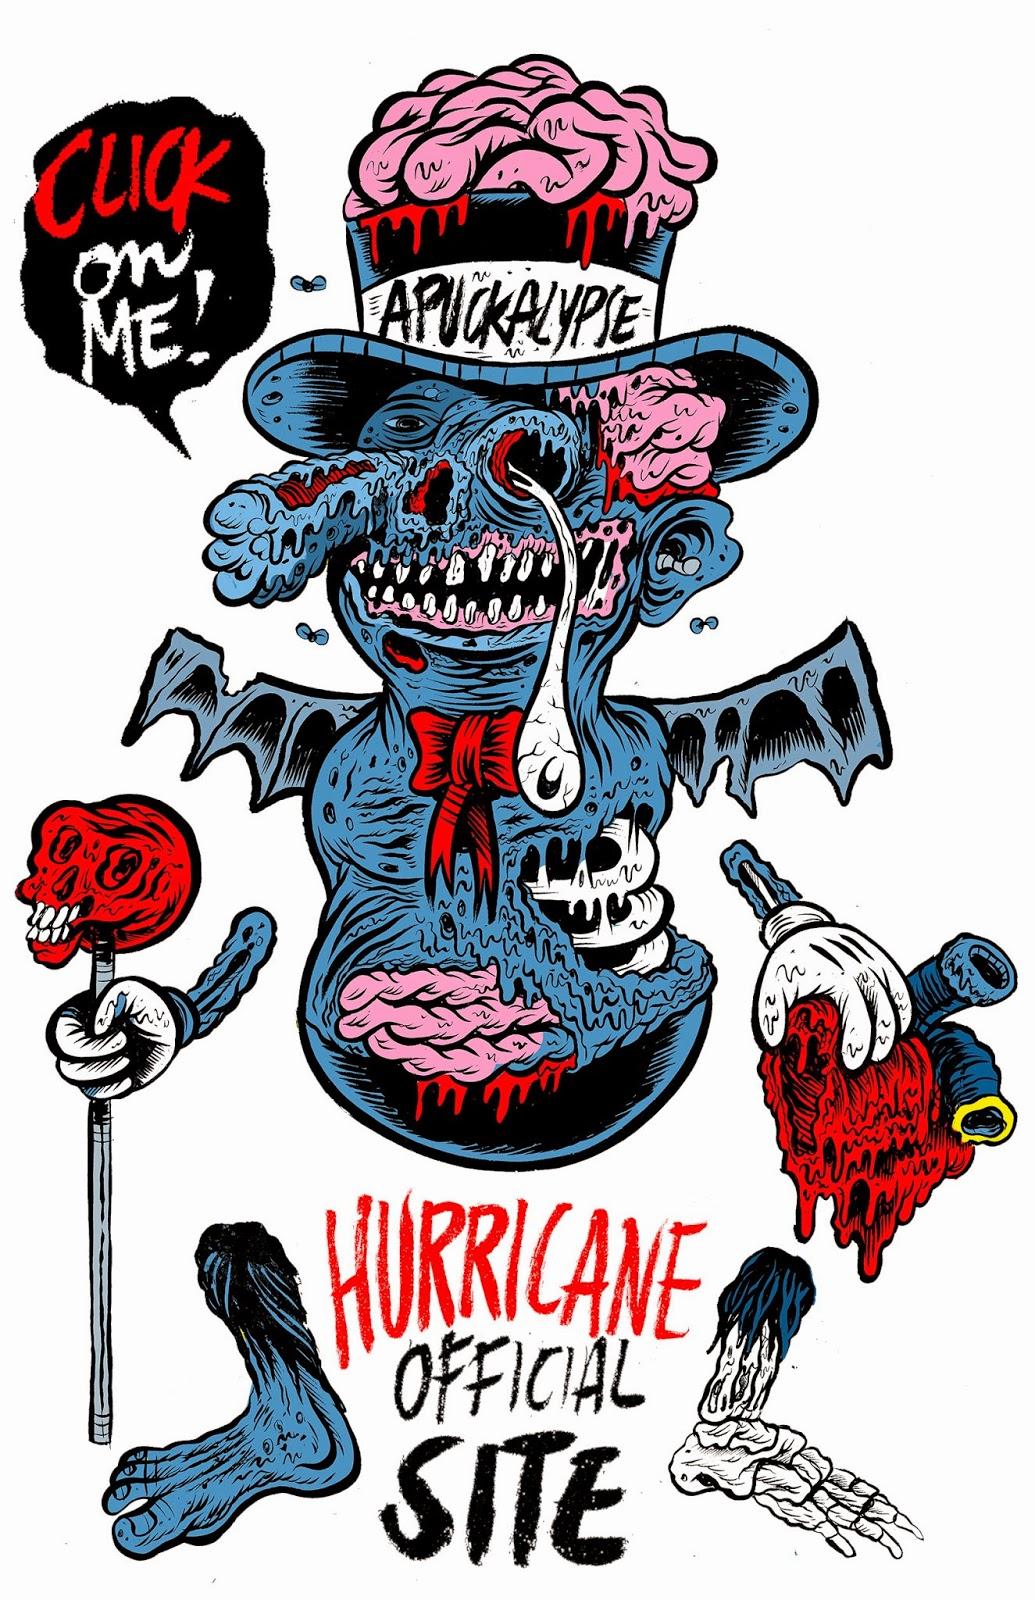 www.hurricaneivan.net